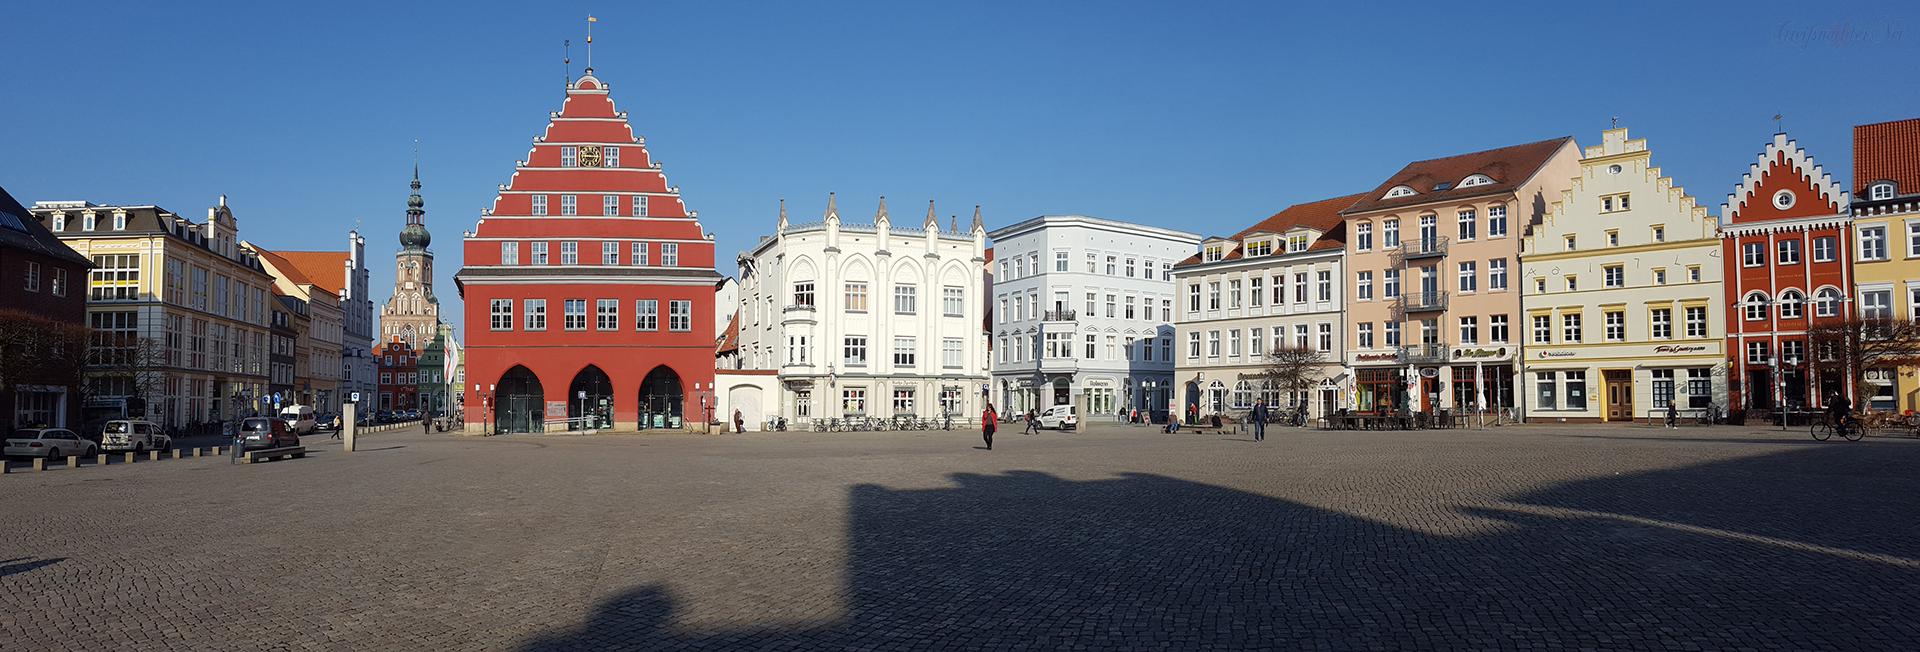 Panorama Marktplatz Greifswald